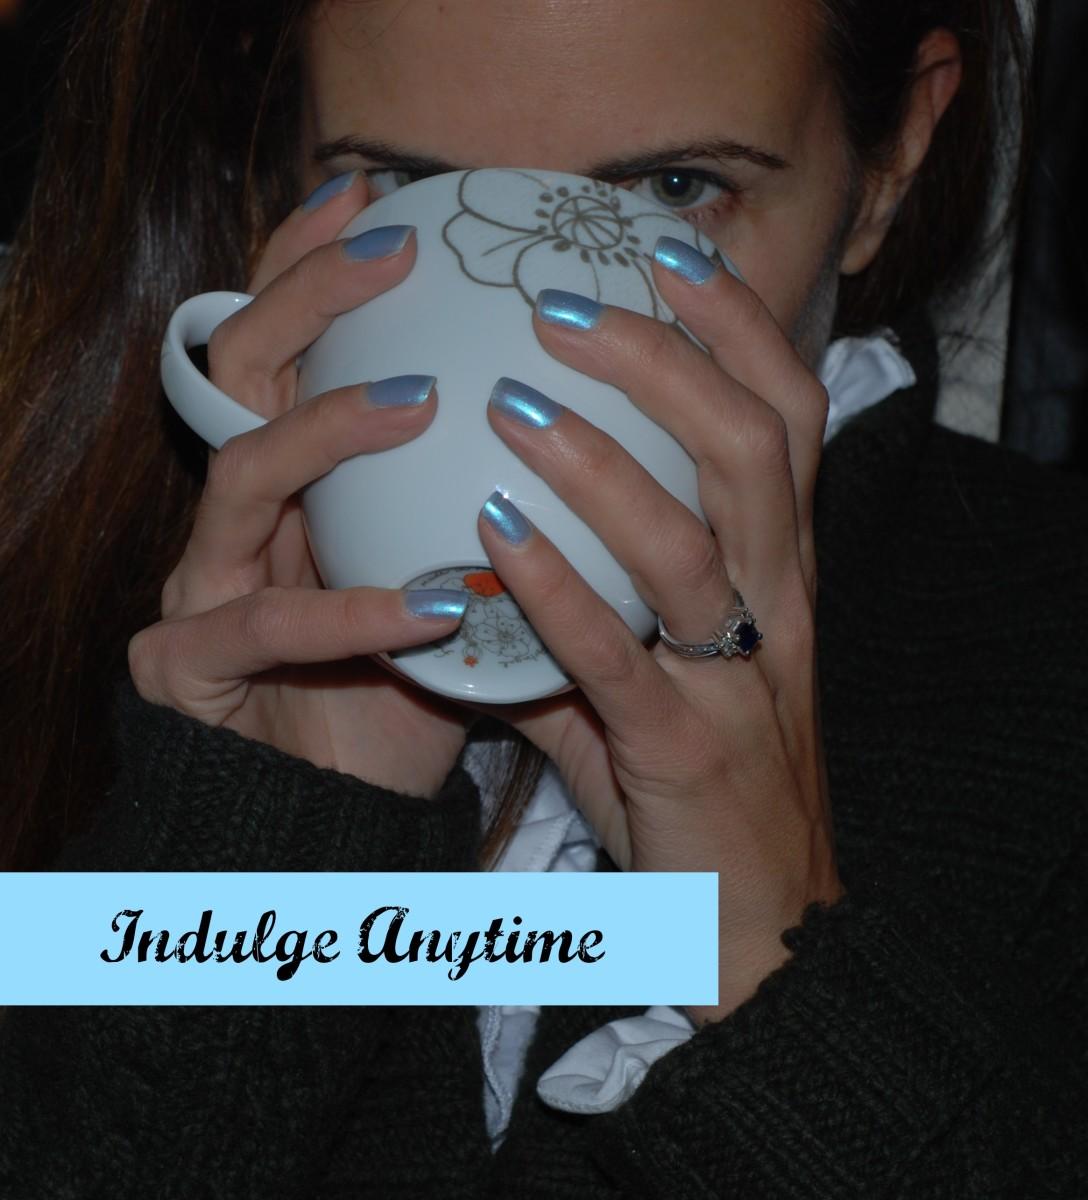 #indulgeanytime